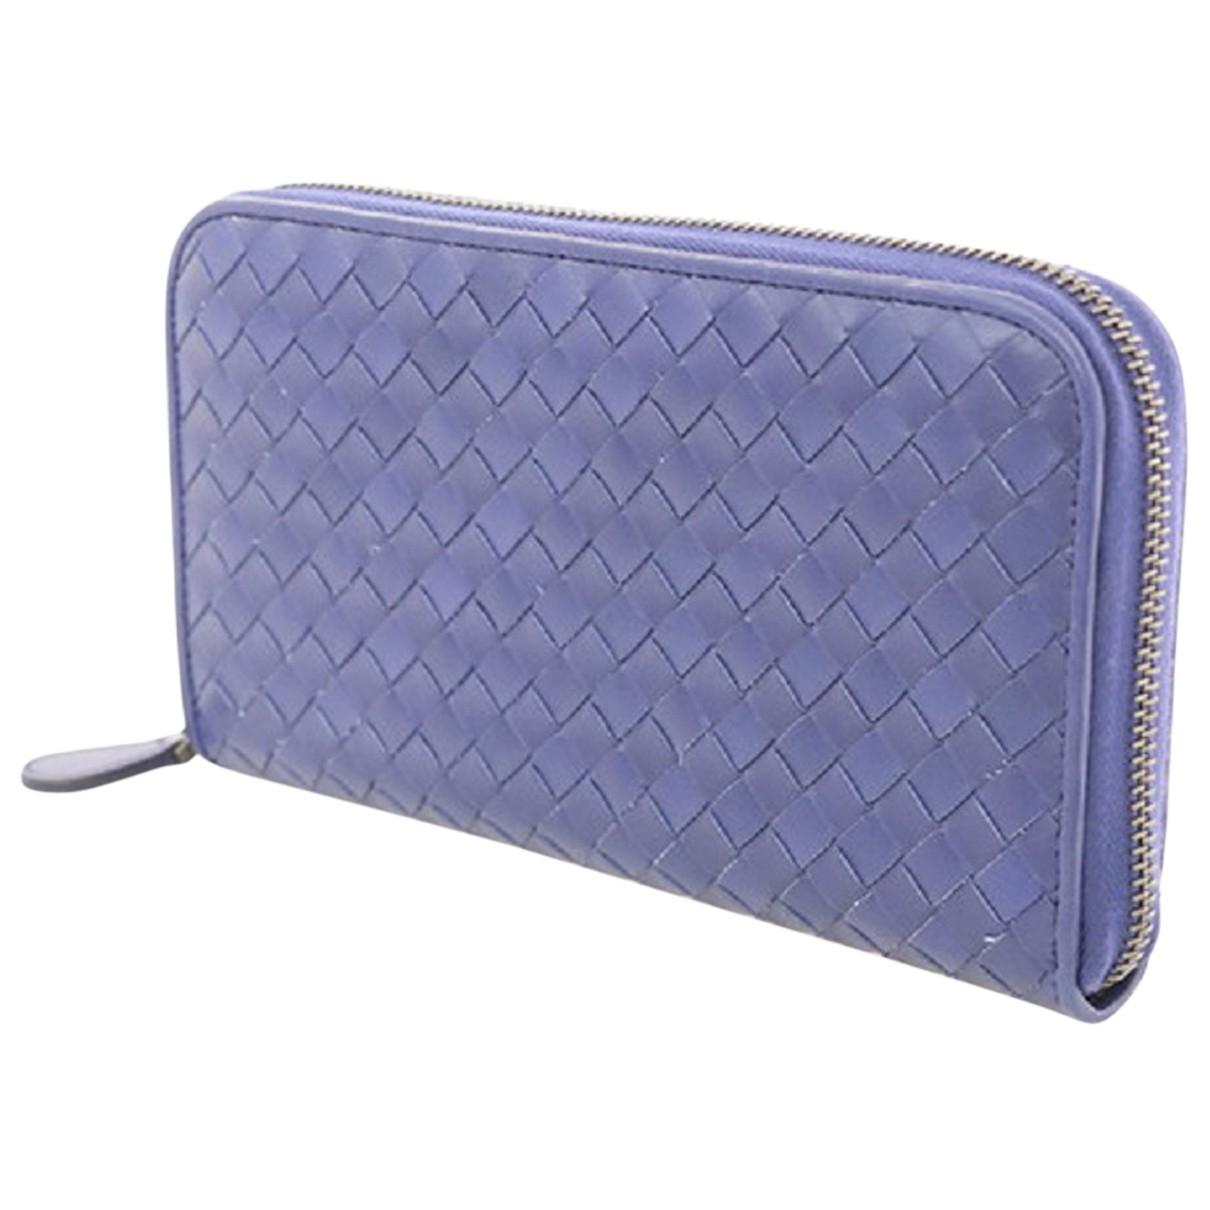 Bottega Veneta Intrecciato Portemonnaie in  Blau Leder